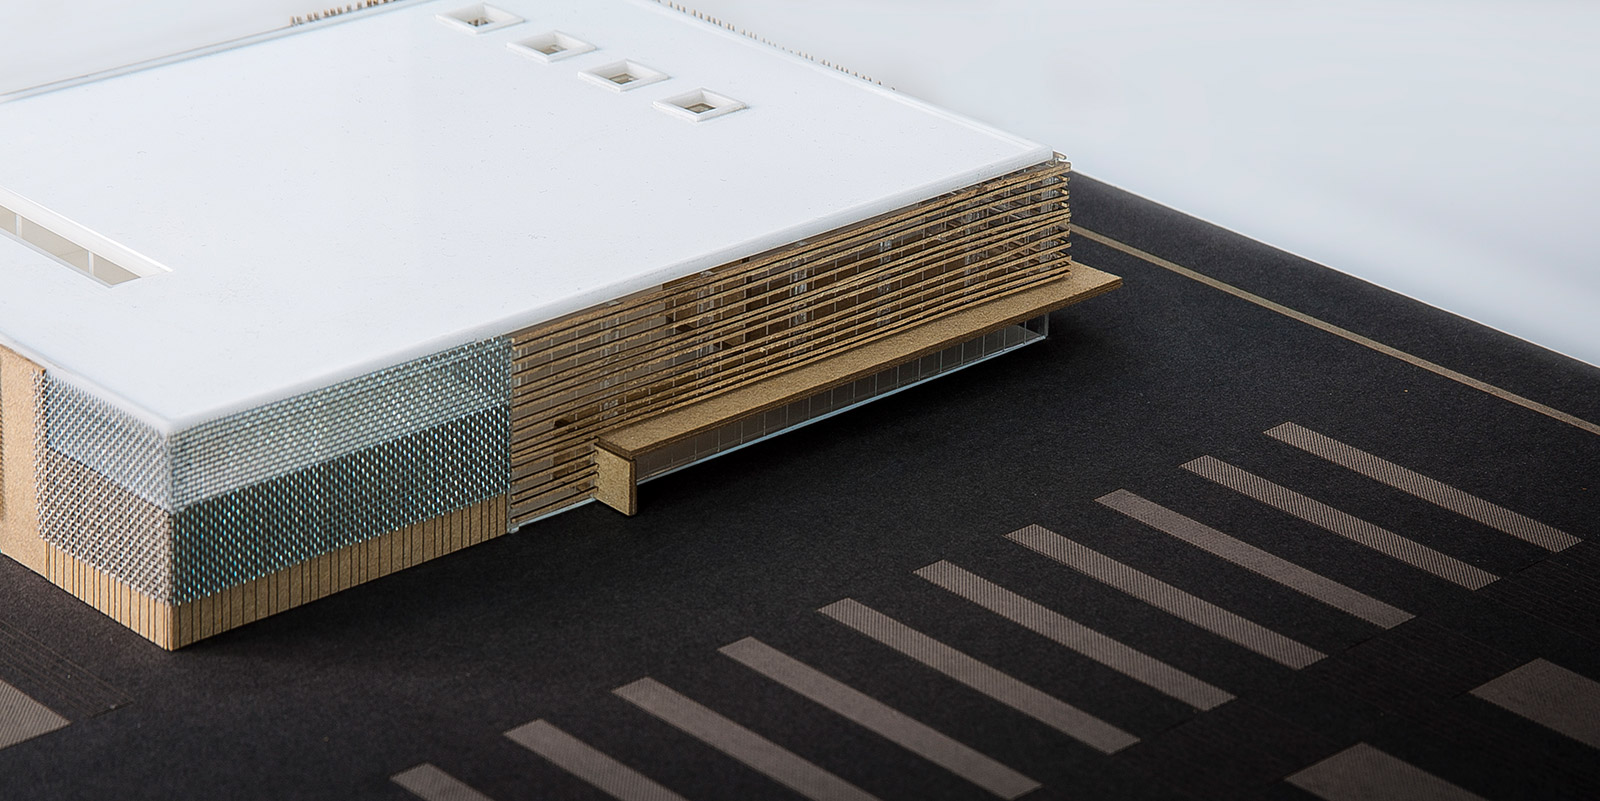 maqueta-arquitectura-architecture-model-tfg-etsav-upv-centro-de-produccion-musical-arquimaqueta-valencia-4